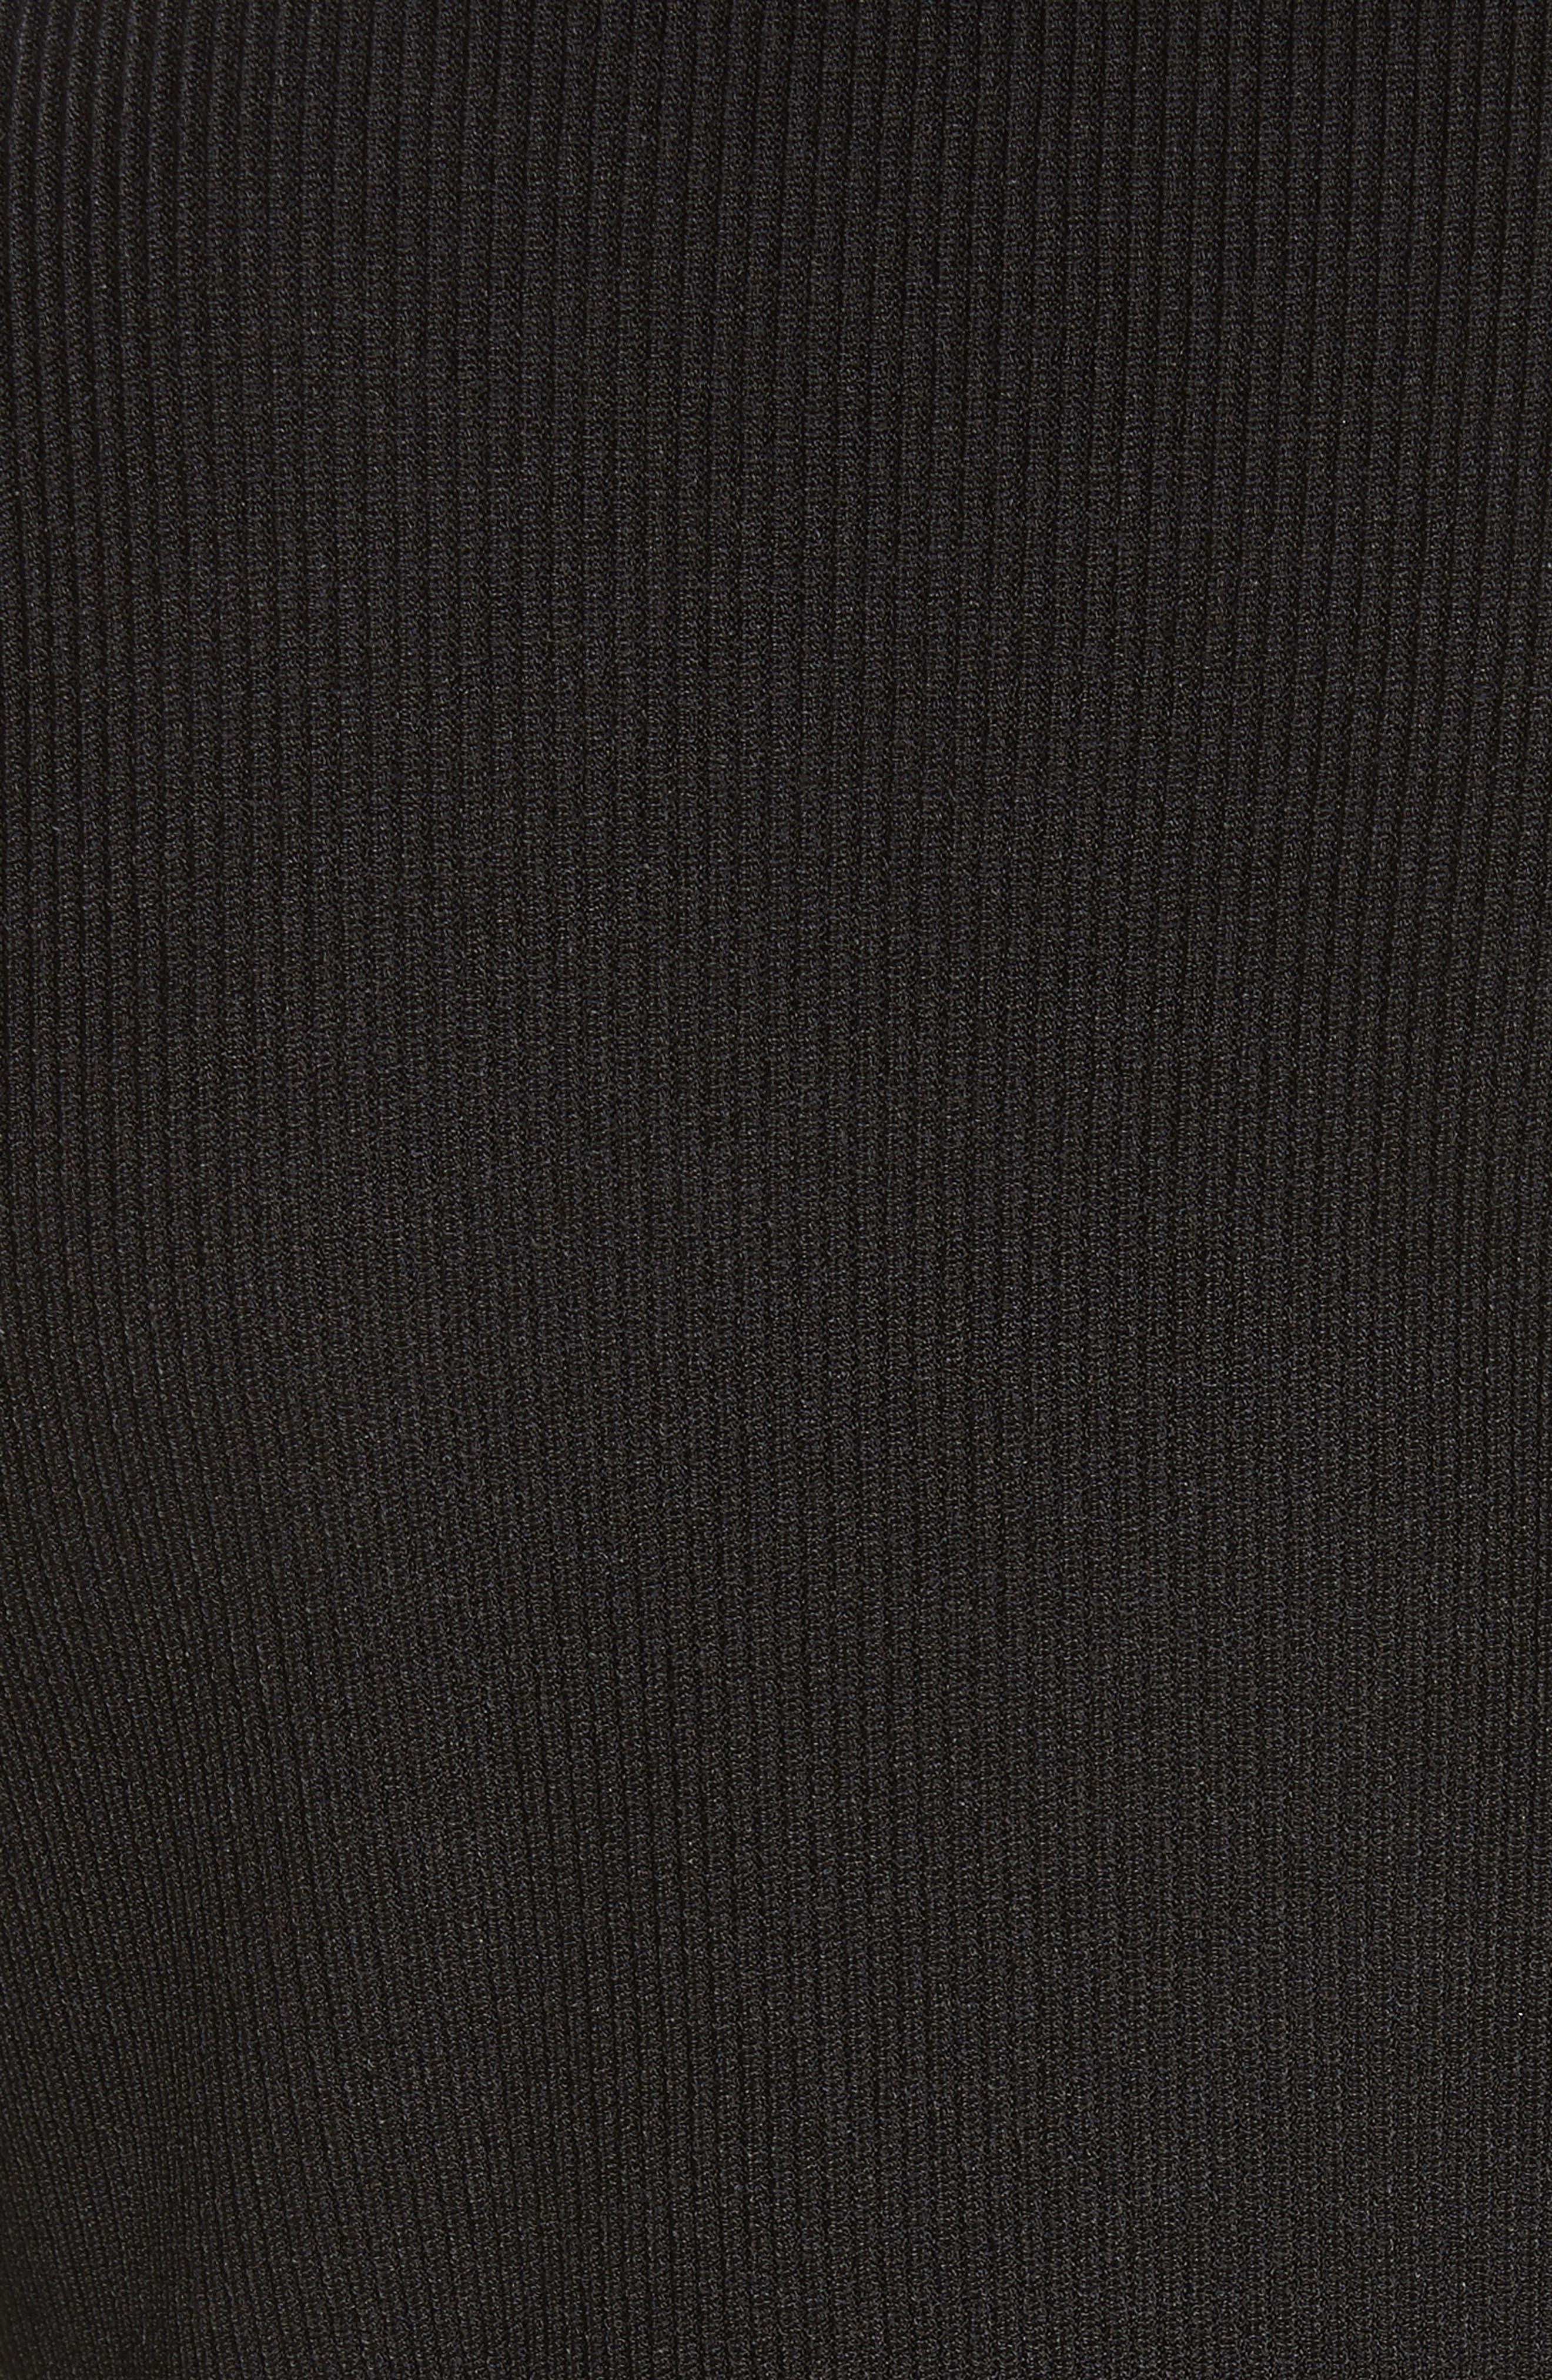 Sienna Ring Detail Knit Top,                             Alternate thumbnail 5, color,                             Black/ Matte Black